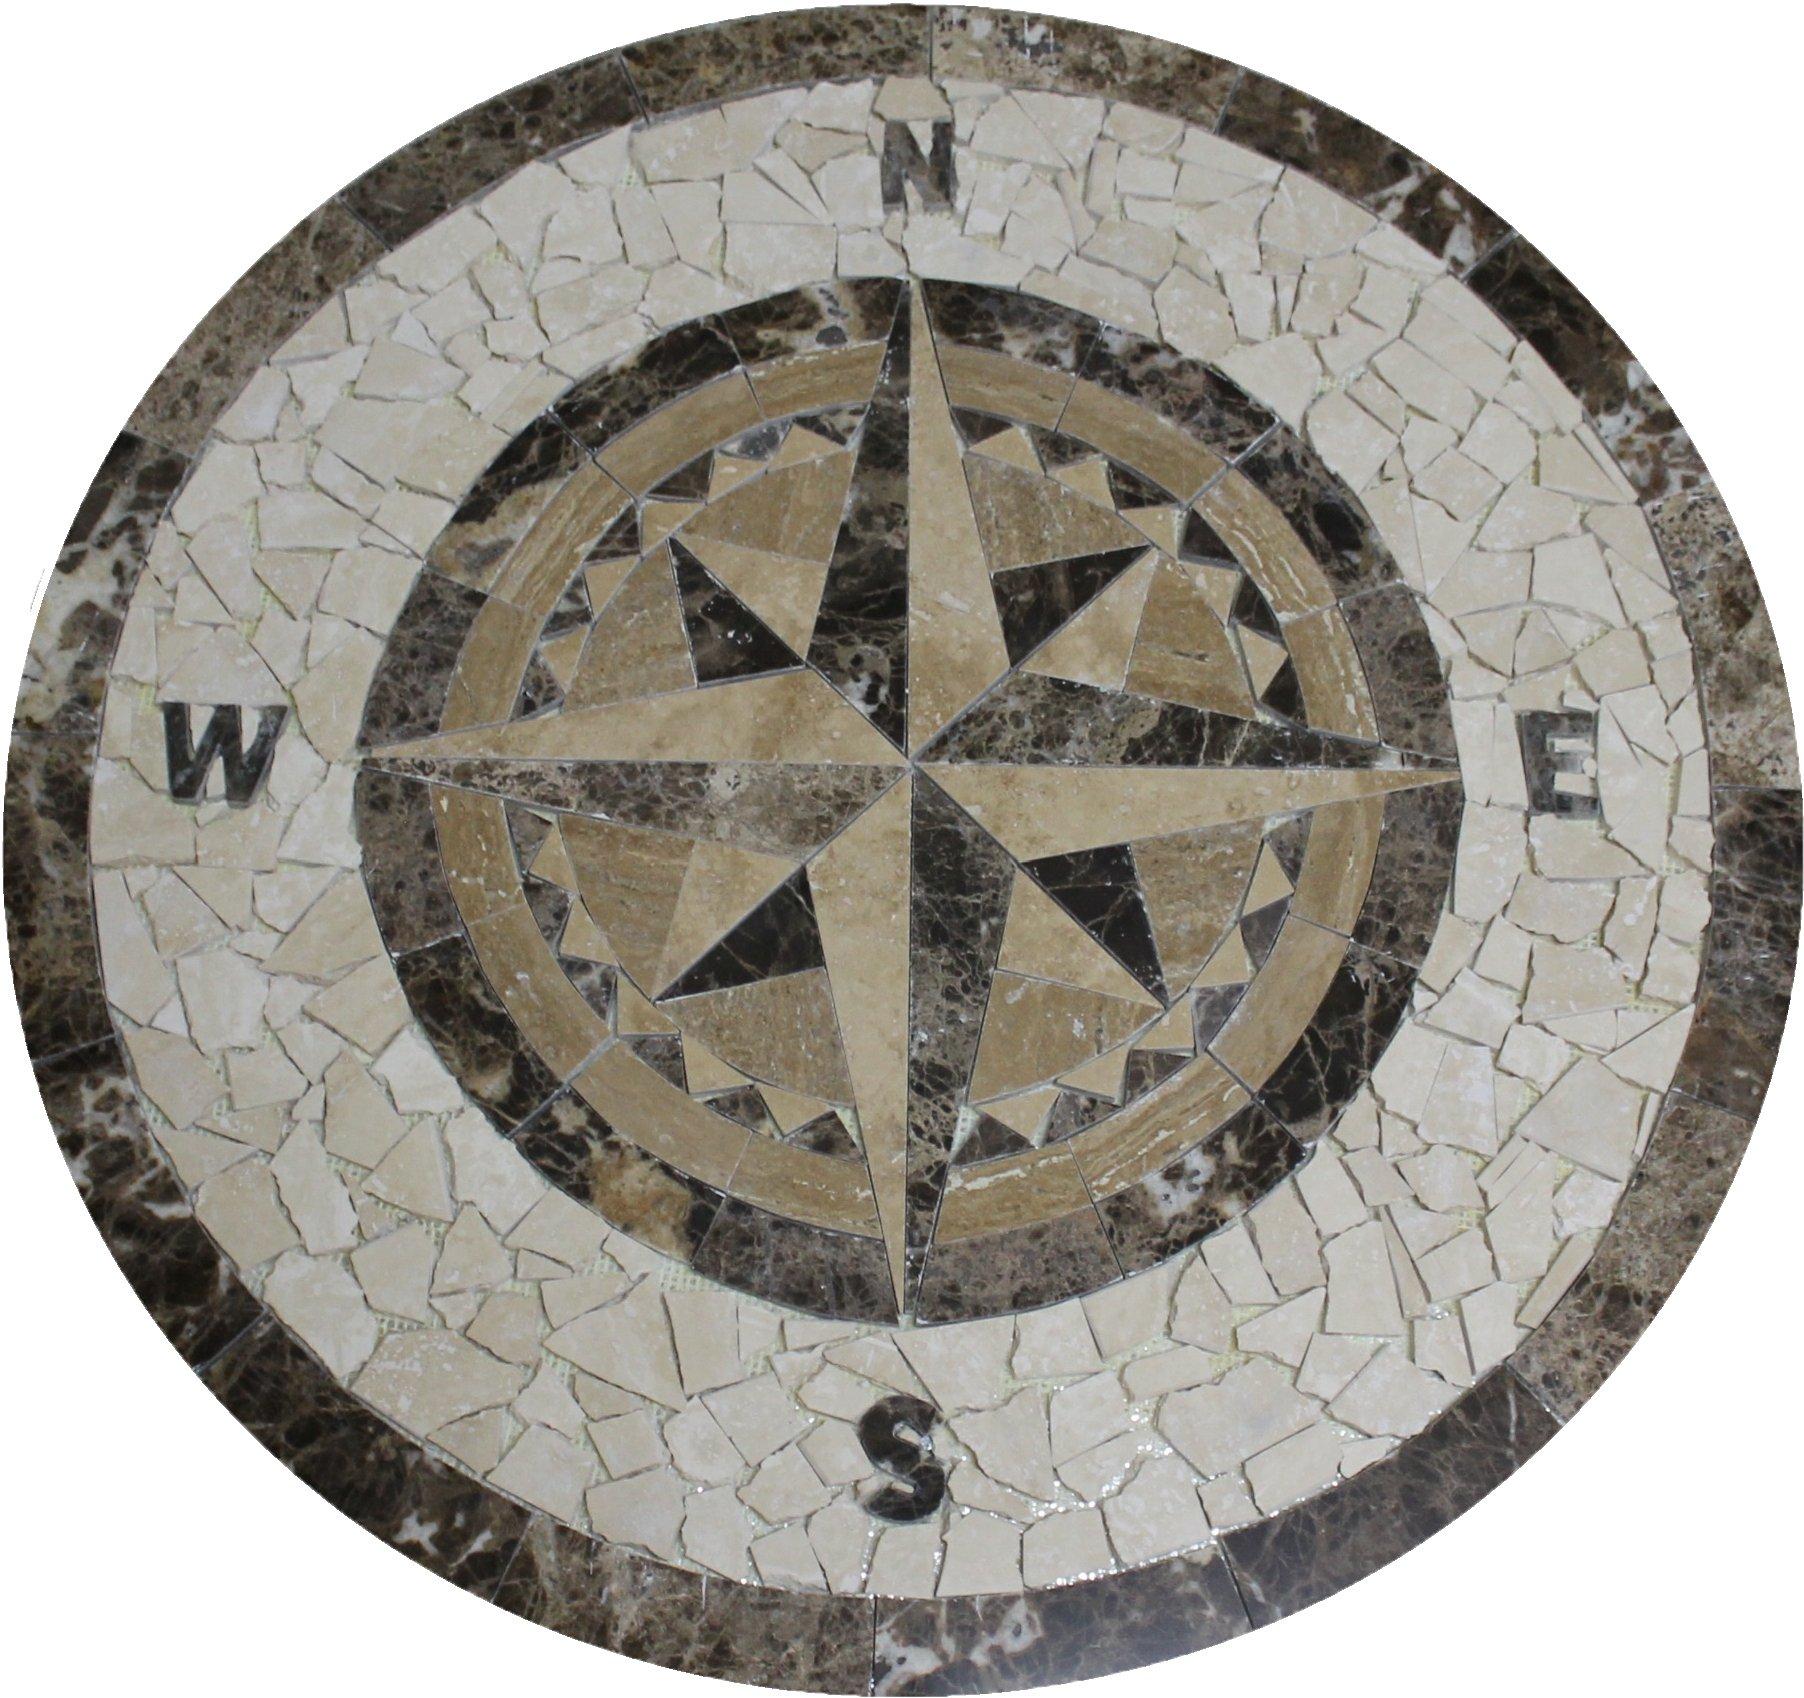 Tile Floor Medallion Marble Mosaic Compass Star Design 36''